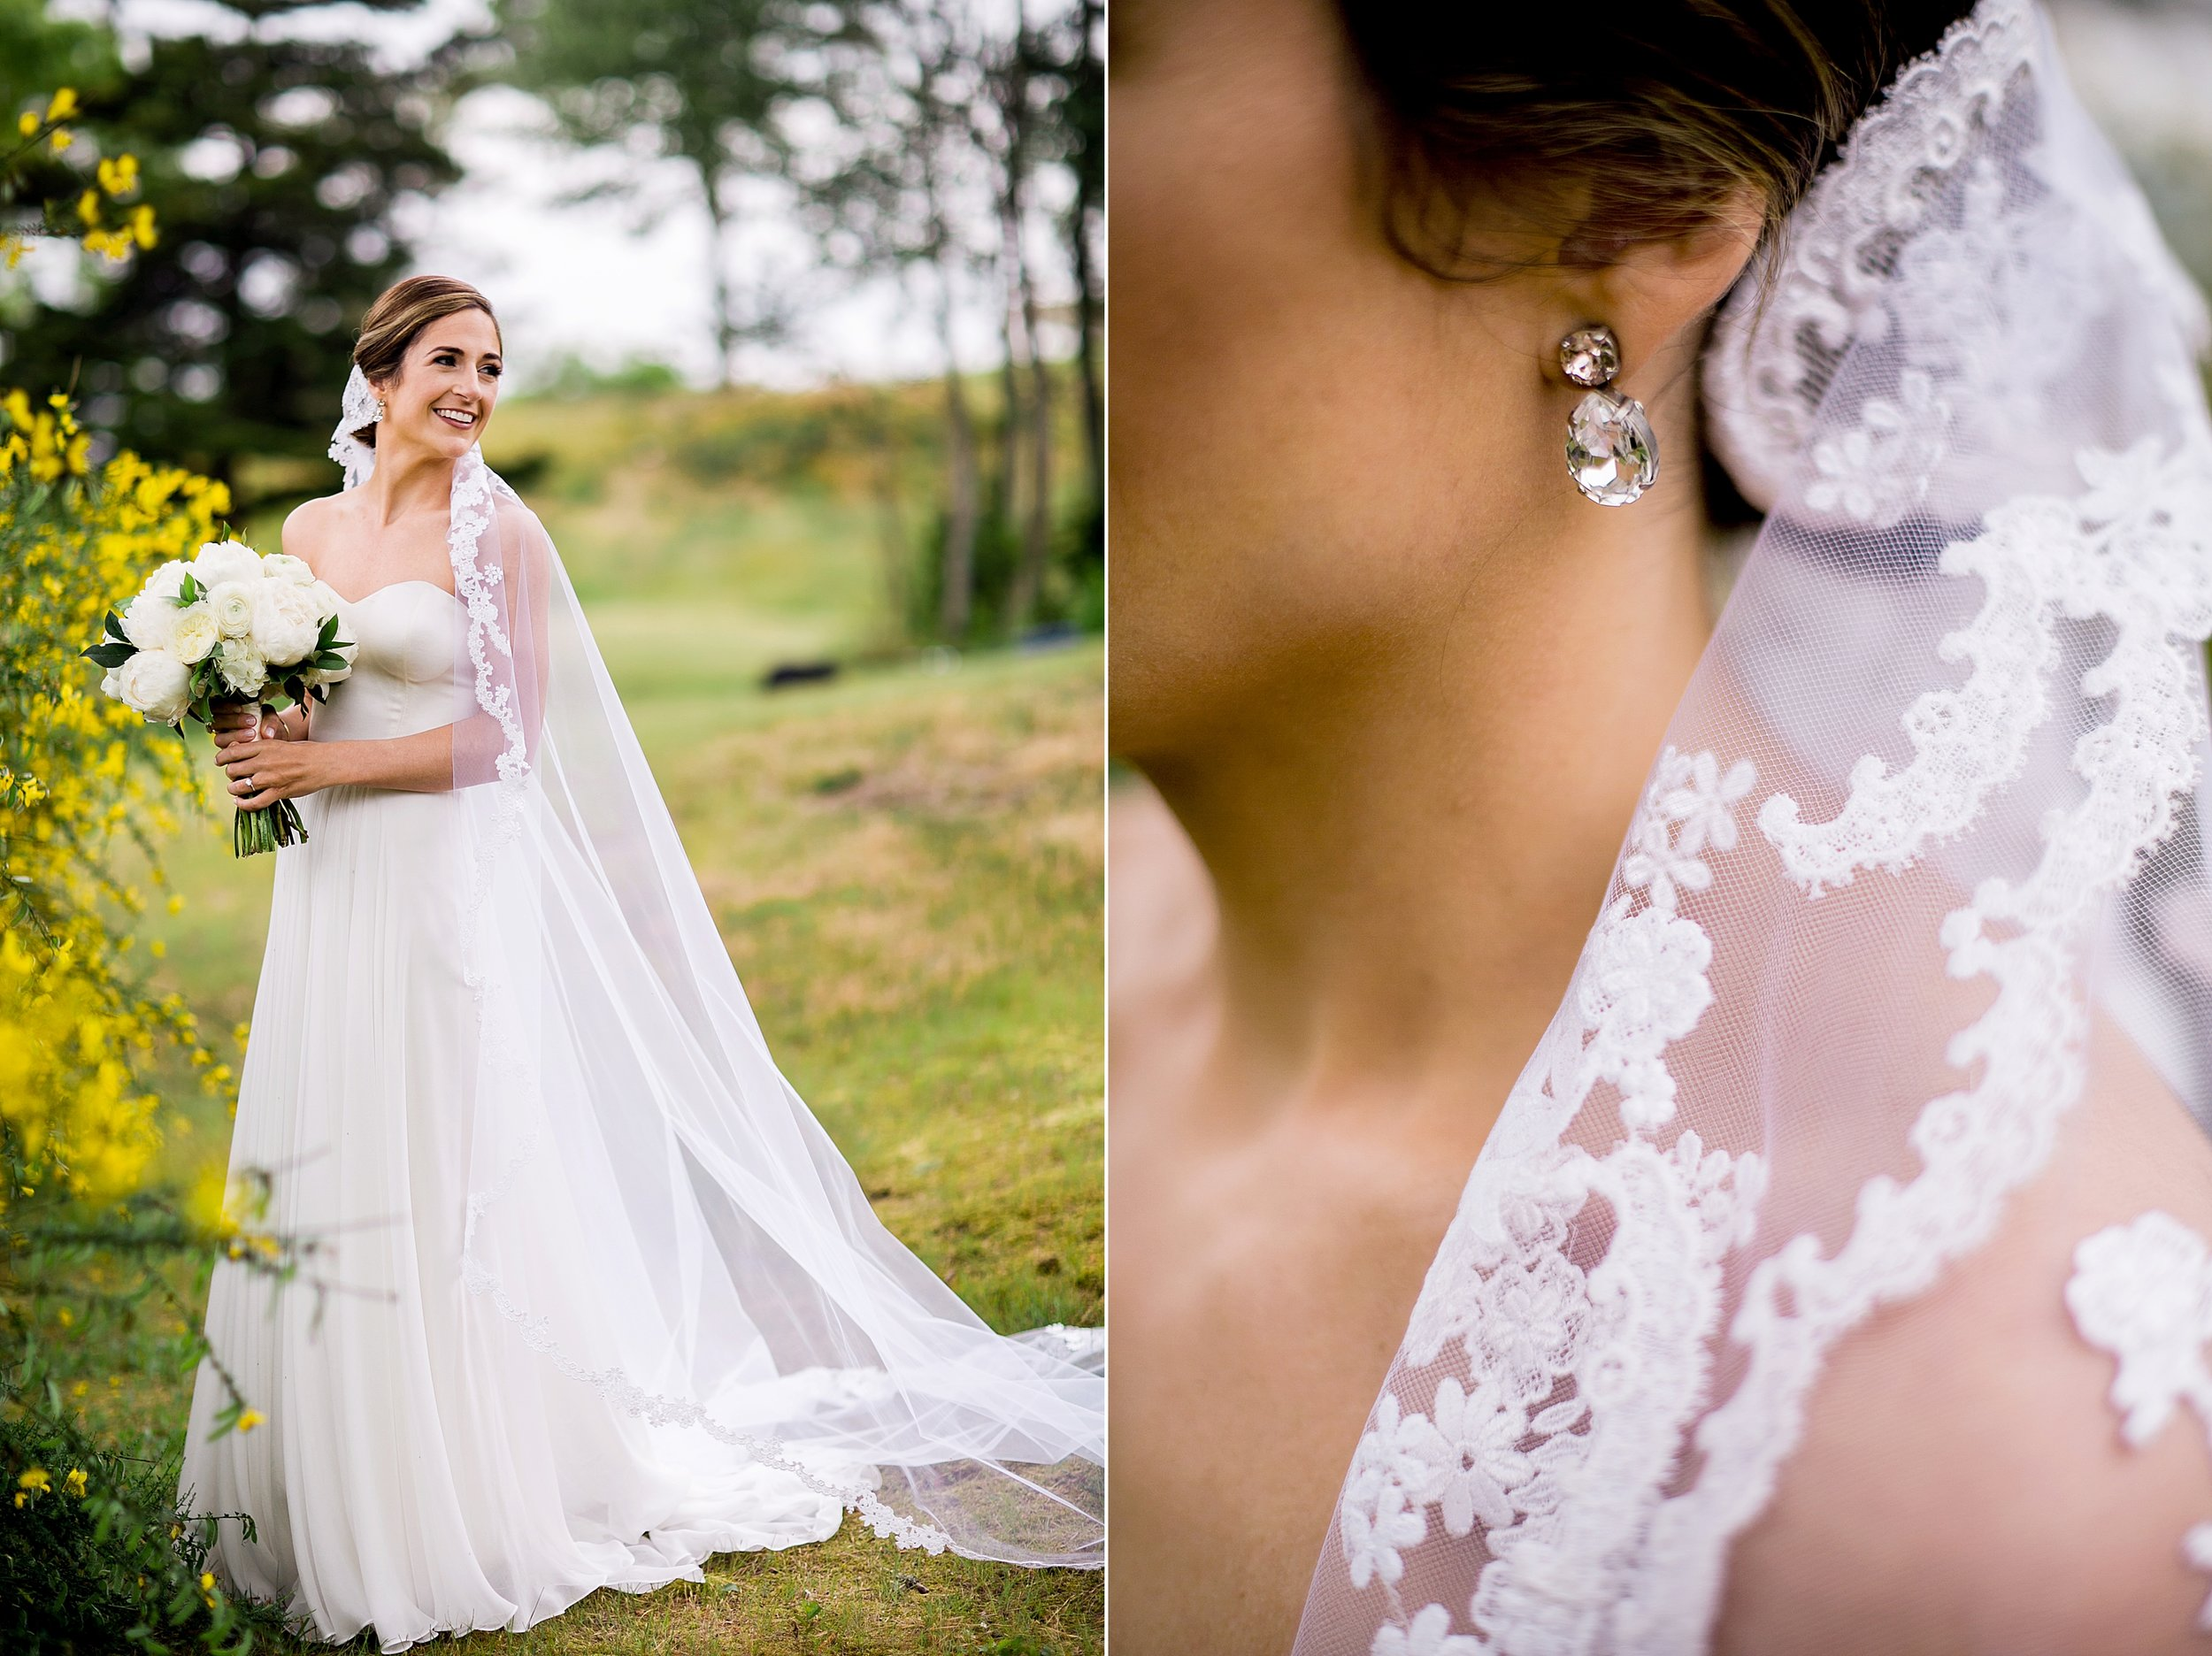 018 los angeles wedding photographer todd danforth photography cape cod.jpg